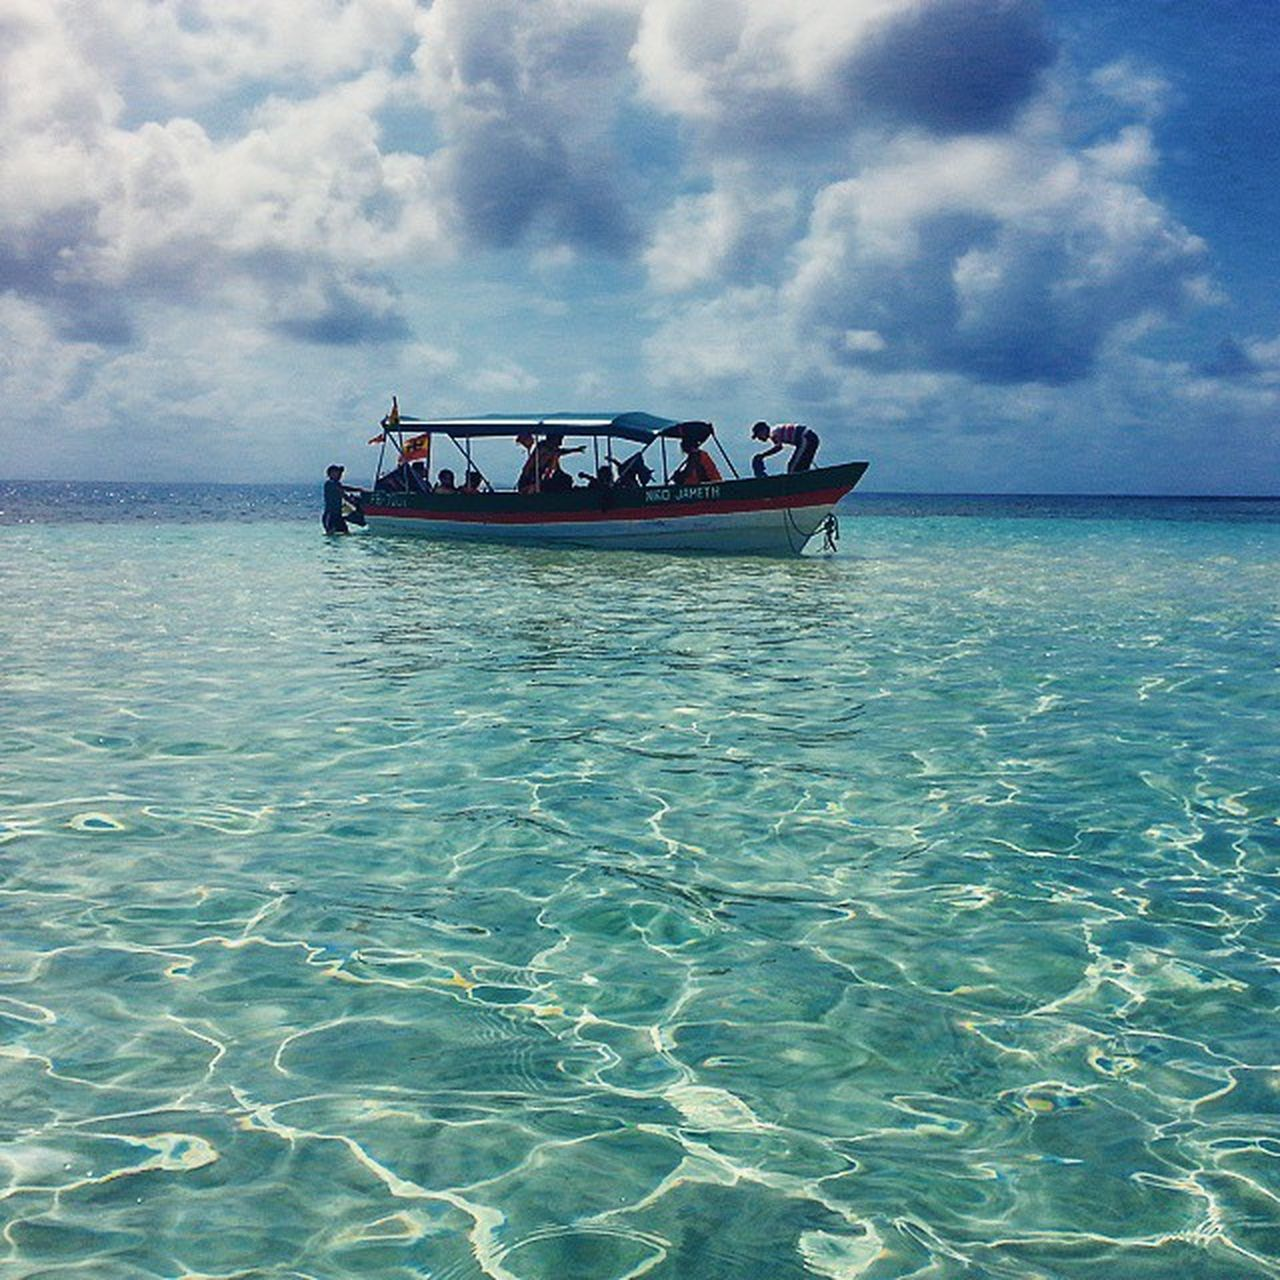 Summer Beach Playa Starfishpool crystalclearclearwatersaguacristalinamaroceanocaribecaribbeannatureswondersgemsparadiseparaisoislabotesunnyday What I Value